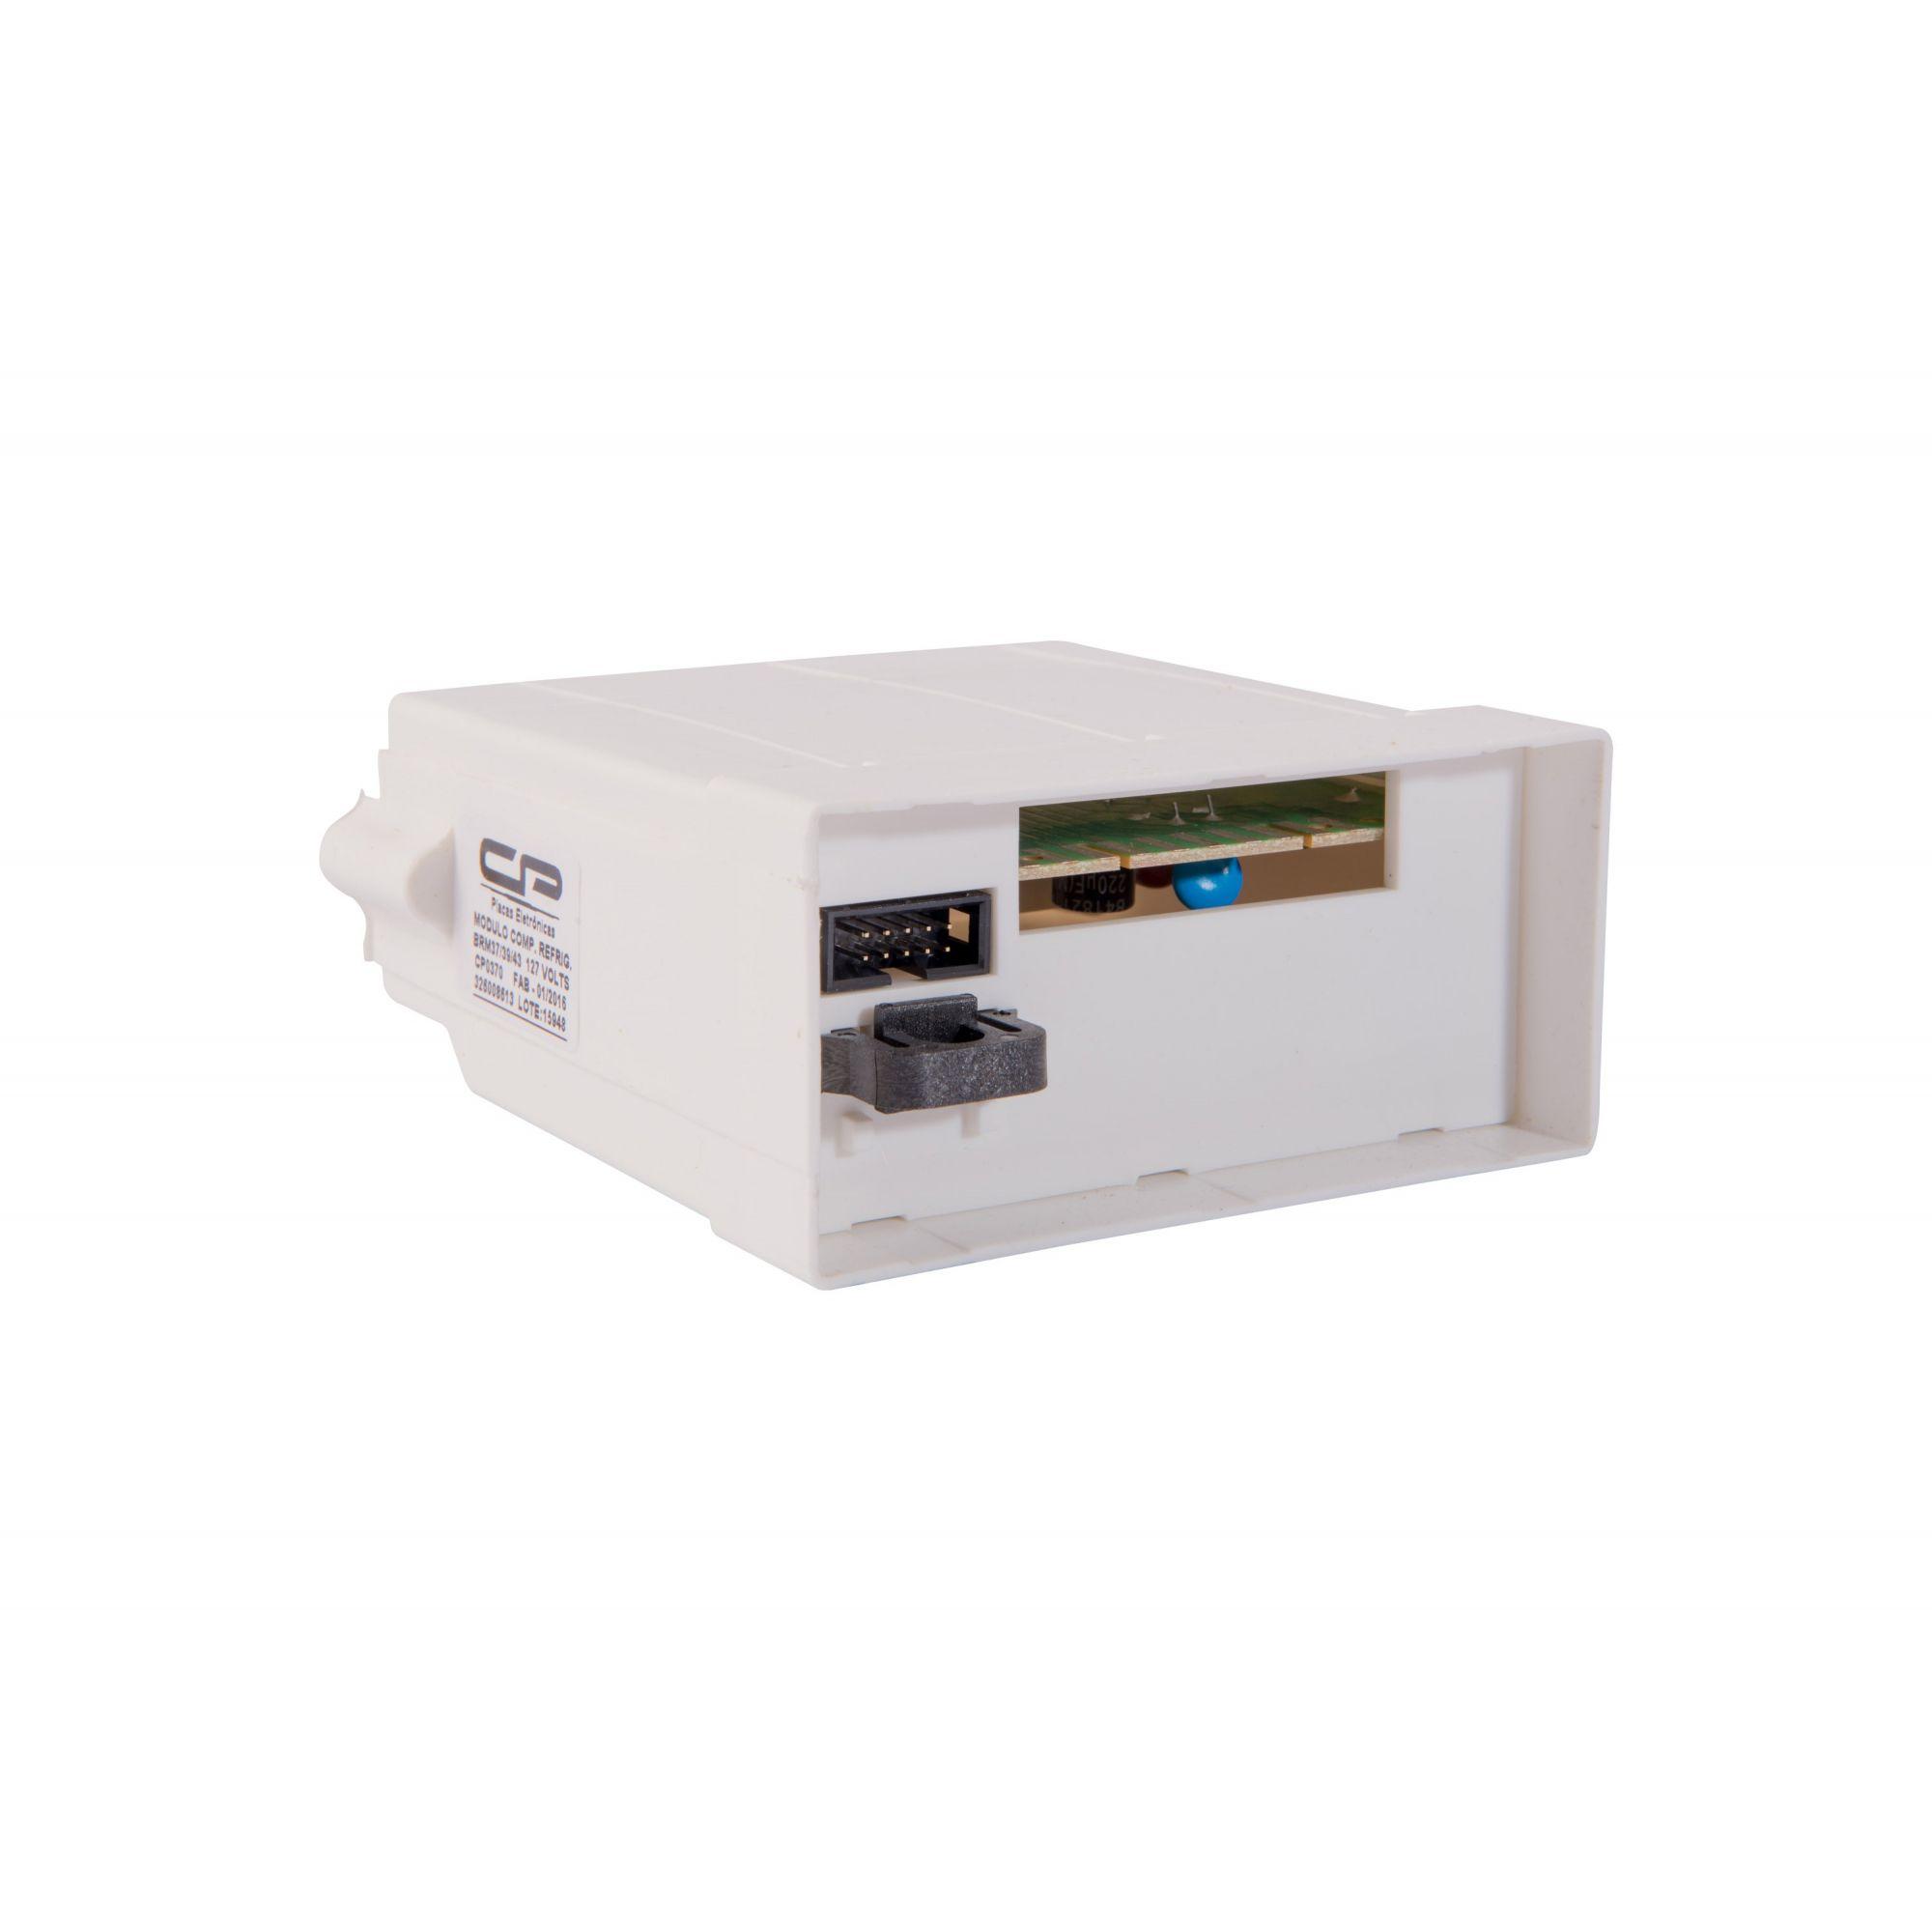 Módulo para Refrigerador Brastemp - BRM37/39/43 - 1270V - CP 0370